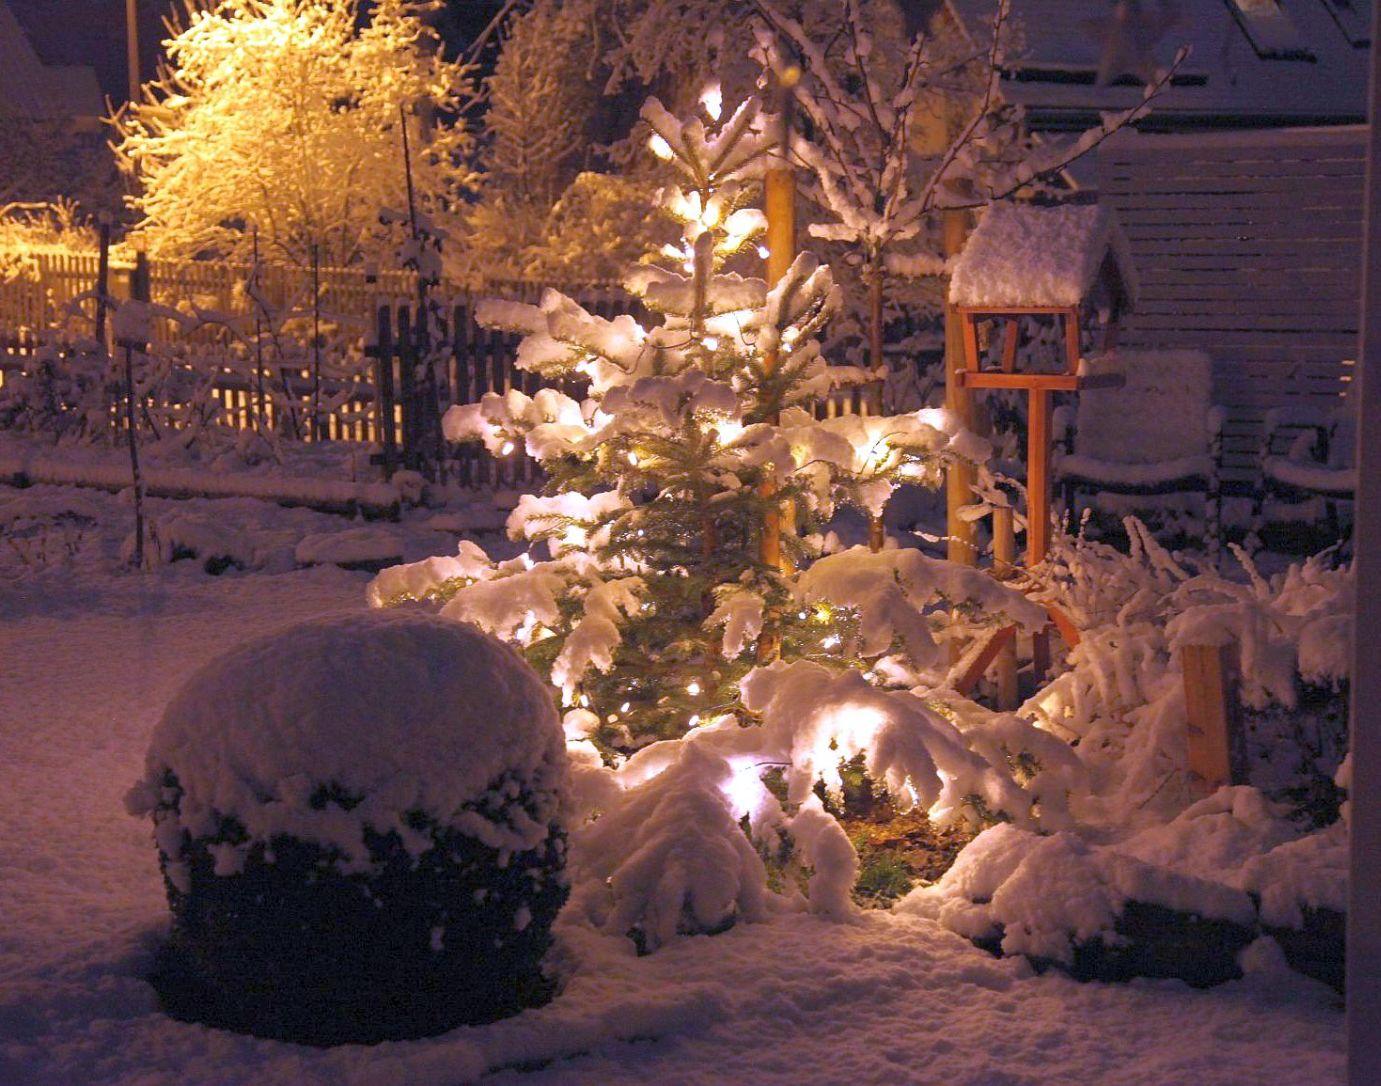 do|mi|s garten: schnee im garten bei nacht, Garten Ideen